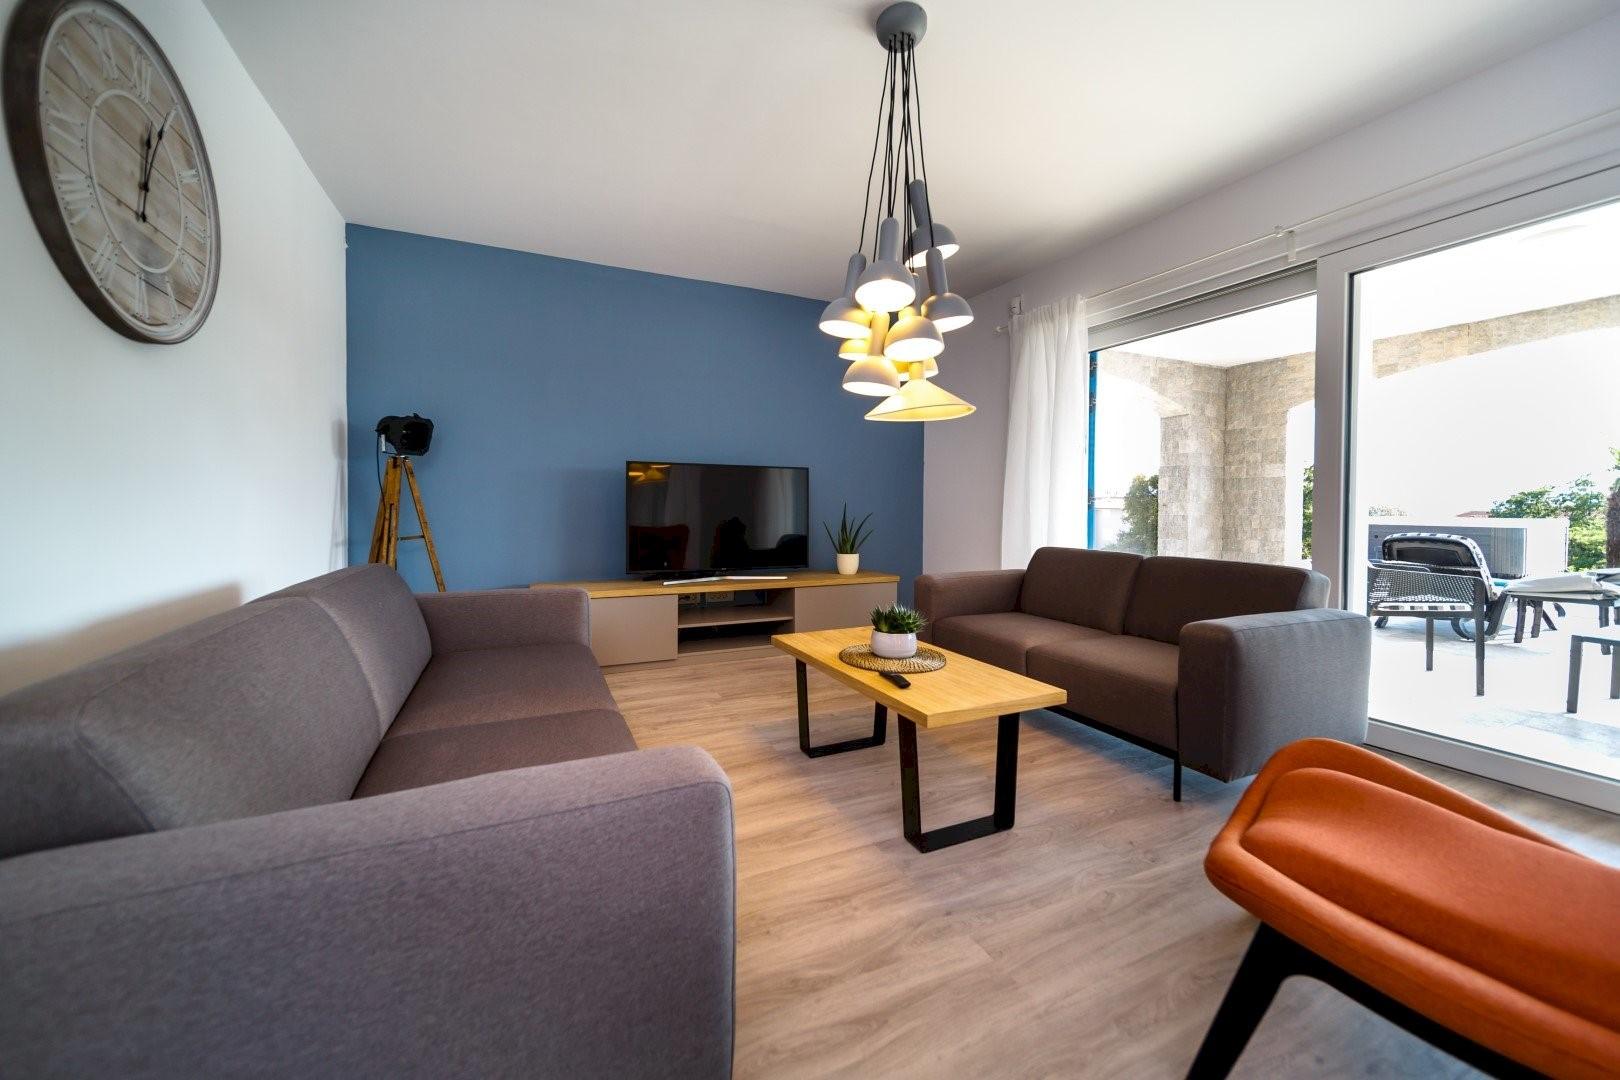 Ferienhaus Luxury Villa Loma 1 (2586644), Sveti Vid-Miholjice, Insel Krk, Kvarner, Kroatien, Bild 6